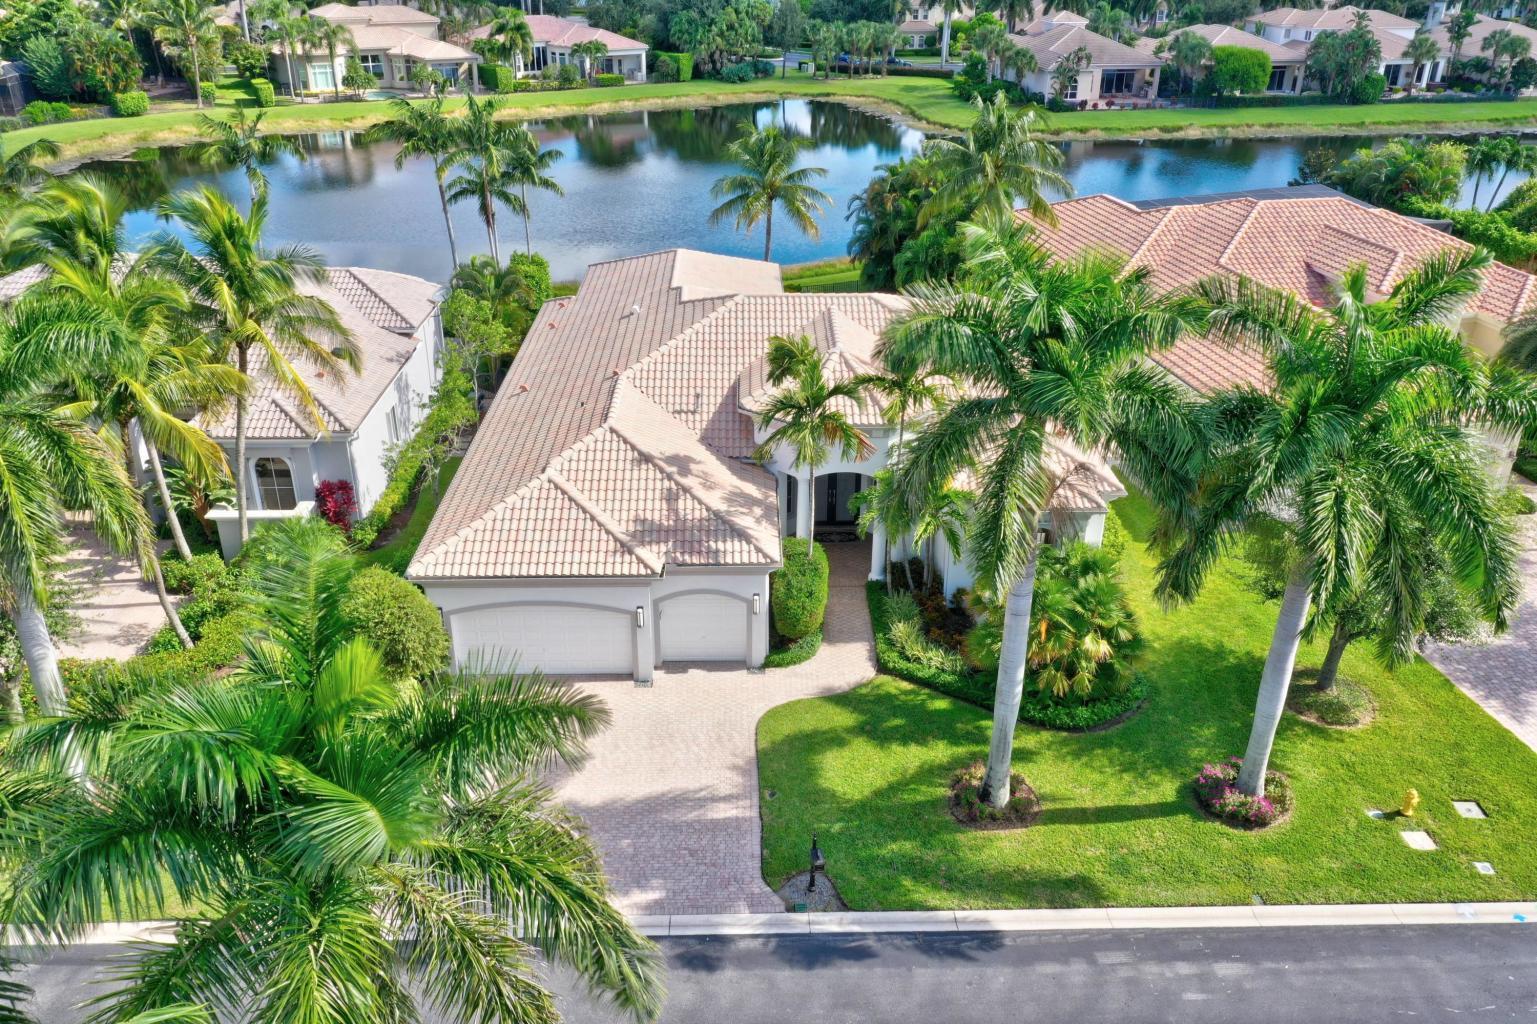 214 Via Emilia, Palm Beach Gardens, Florida 33418, 4 Bedrooms Bedrooms, ,4 BathroomsBathrooms,F,Single family,Via Emilia,RX-10612288